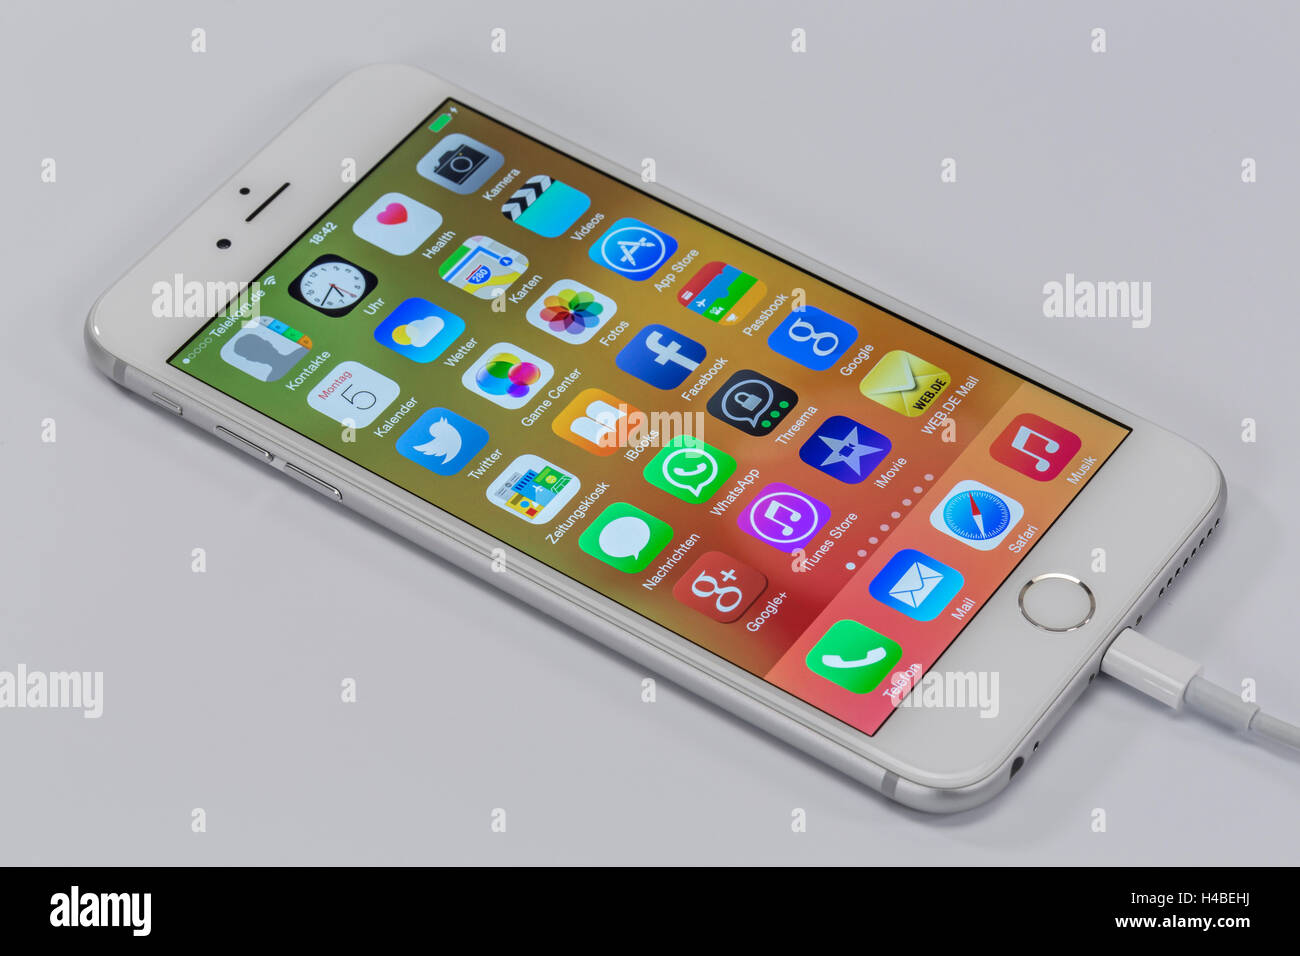 Apple Iphone 6 Plus Fulmine Il Connettore Cavo Usb Display